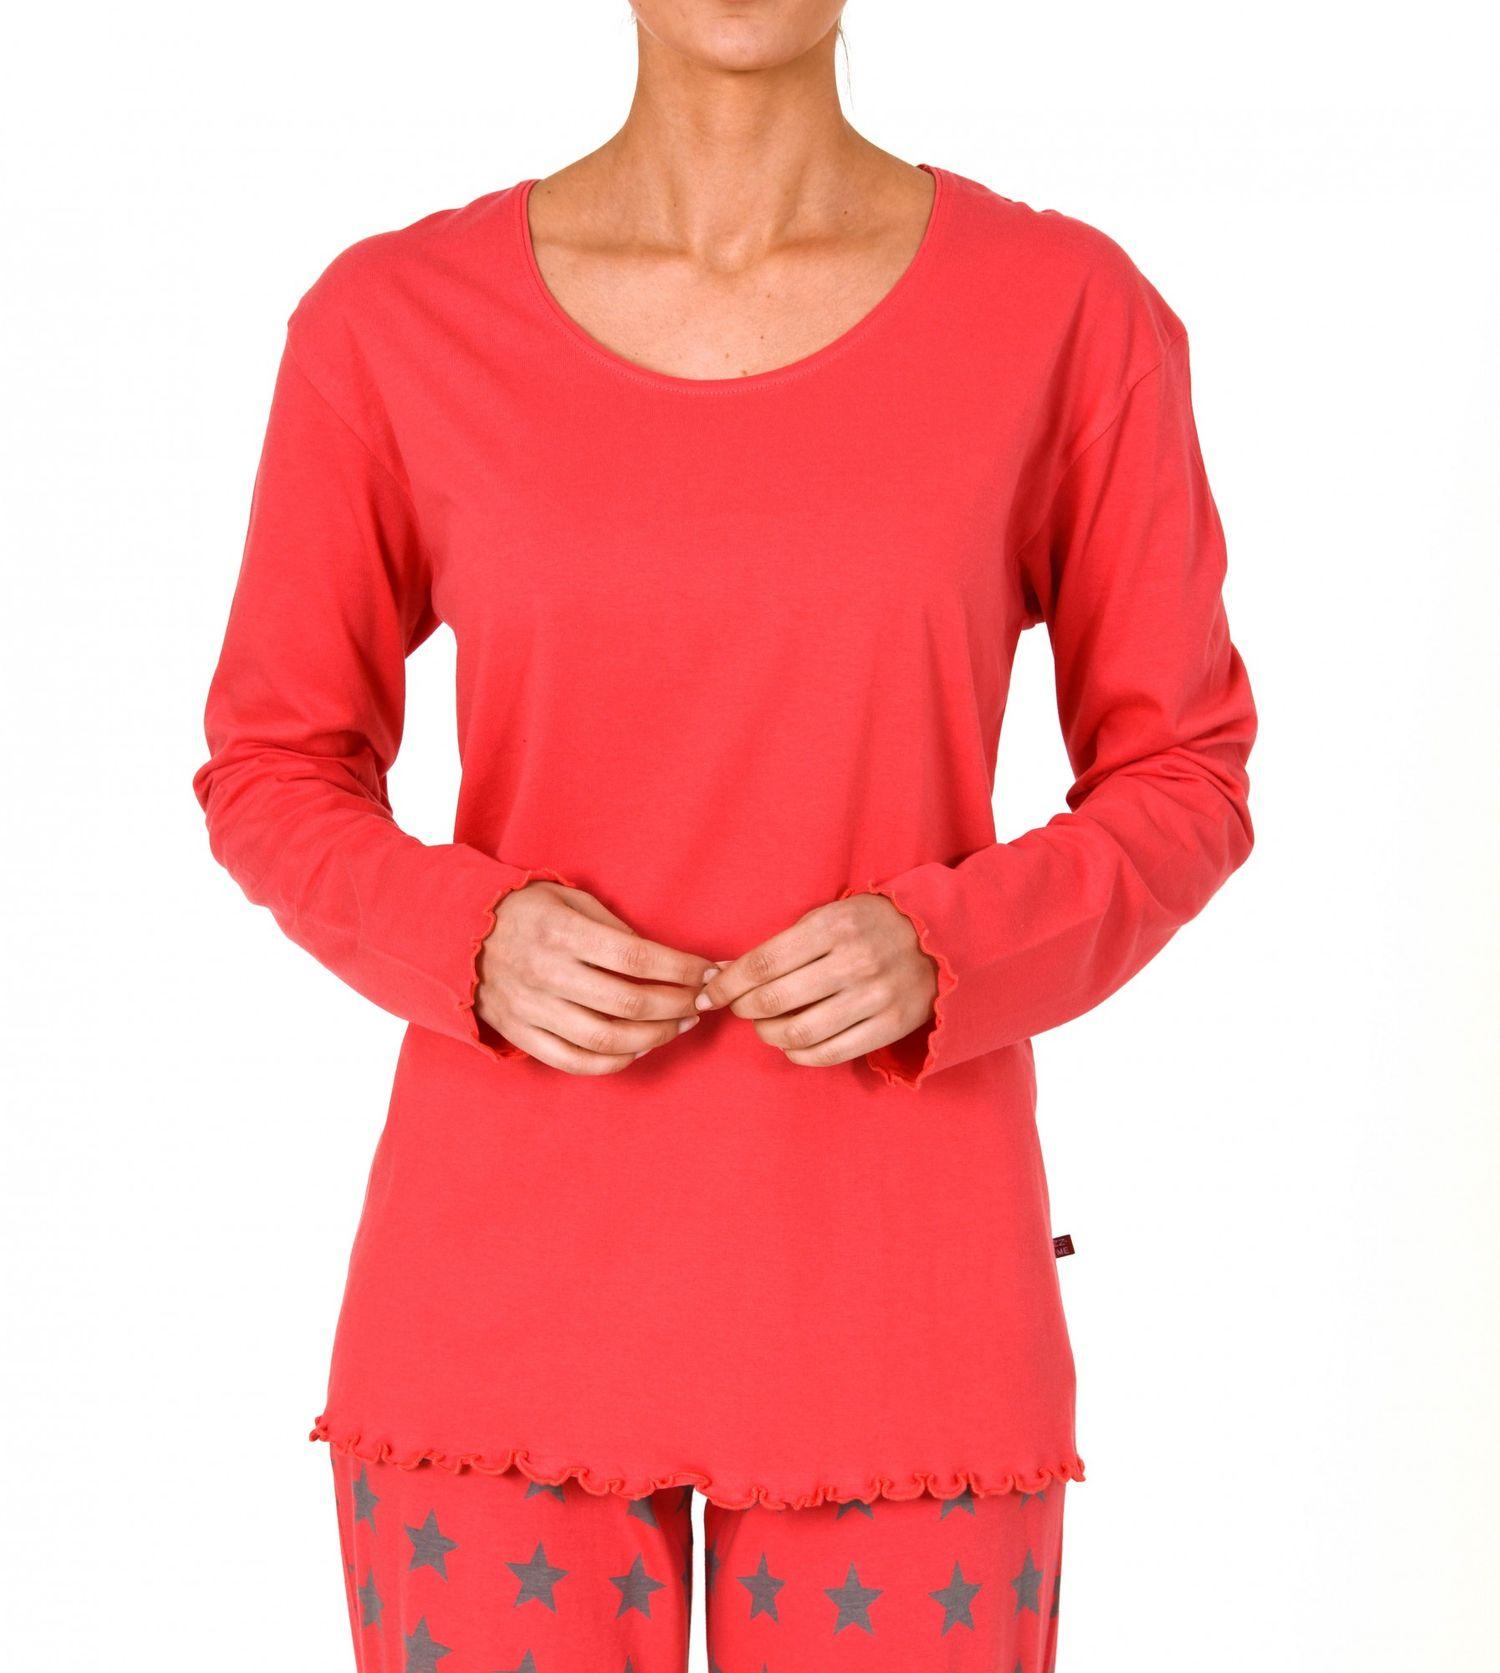 Damen Shirt - Oberteil langarm Mix & Match blau, rot oder creme, 251 219 90 161